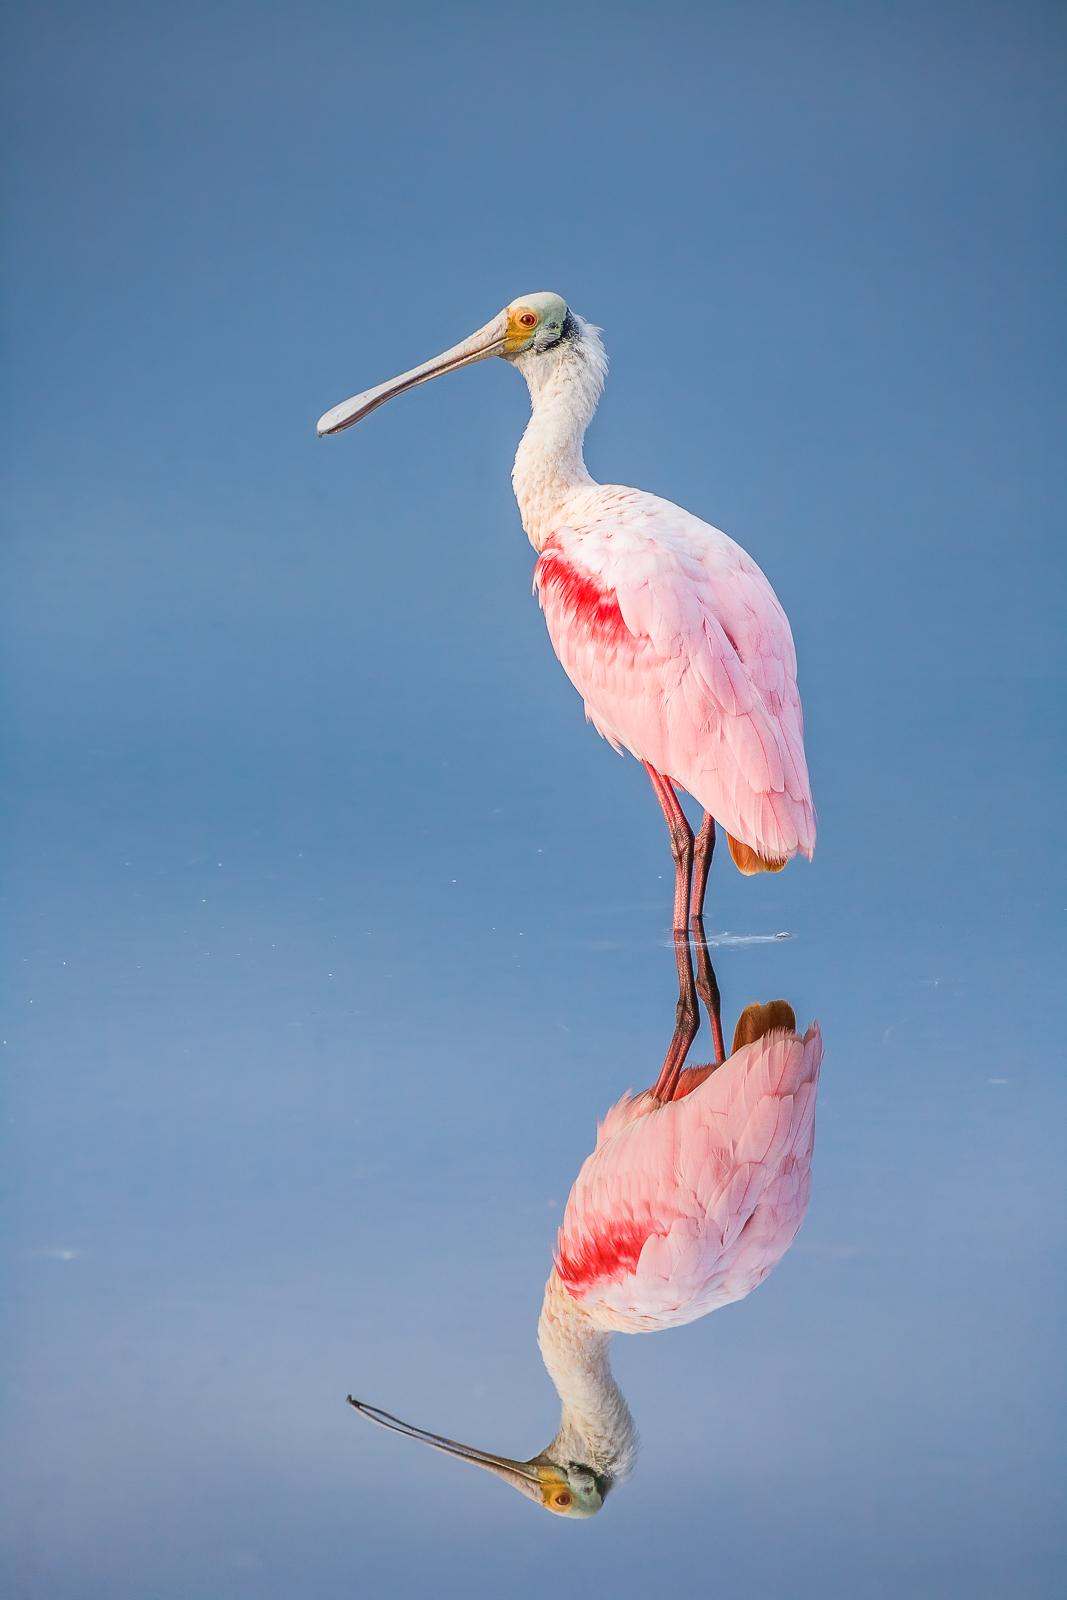 Rosey Spoon,Ajaja,Animal,Bird,Hunting,Roseate Spoonbill,Vertical,Wading Bird,Wildlife,Winter,eating, photo